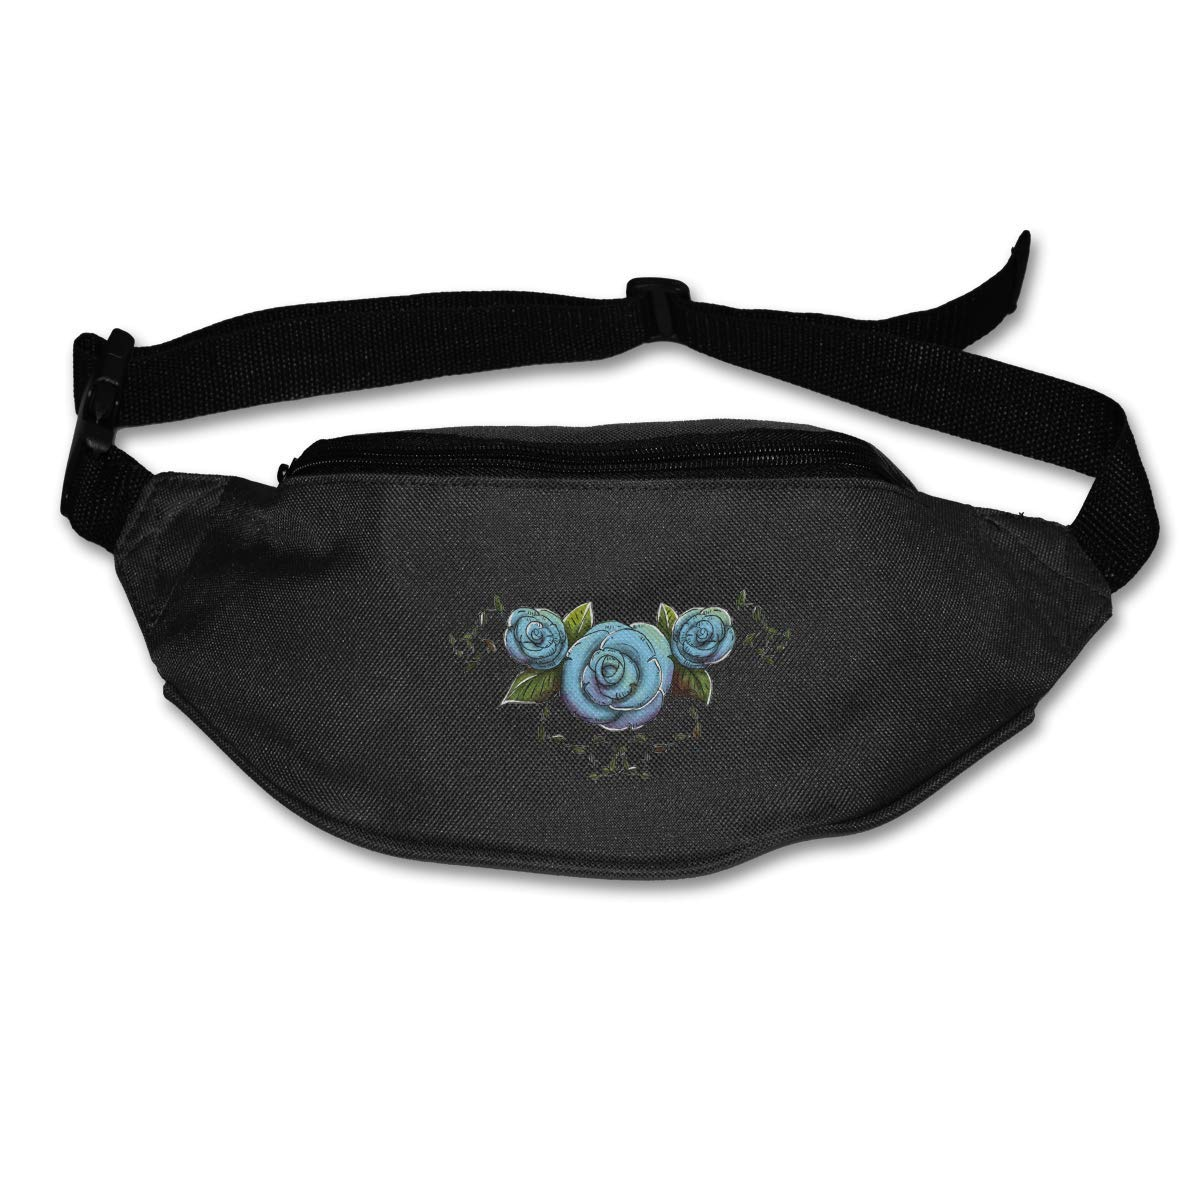 Waist Purse Thank You with Blue Flower Unisex Outdoor Sports Pouch Fitness Runners Waist Bags